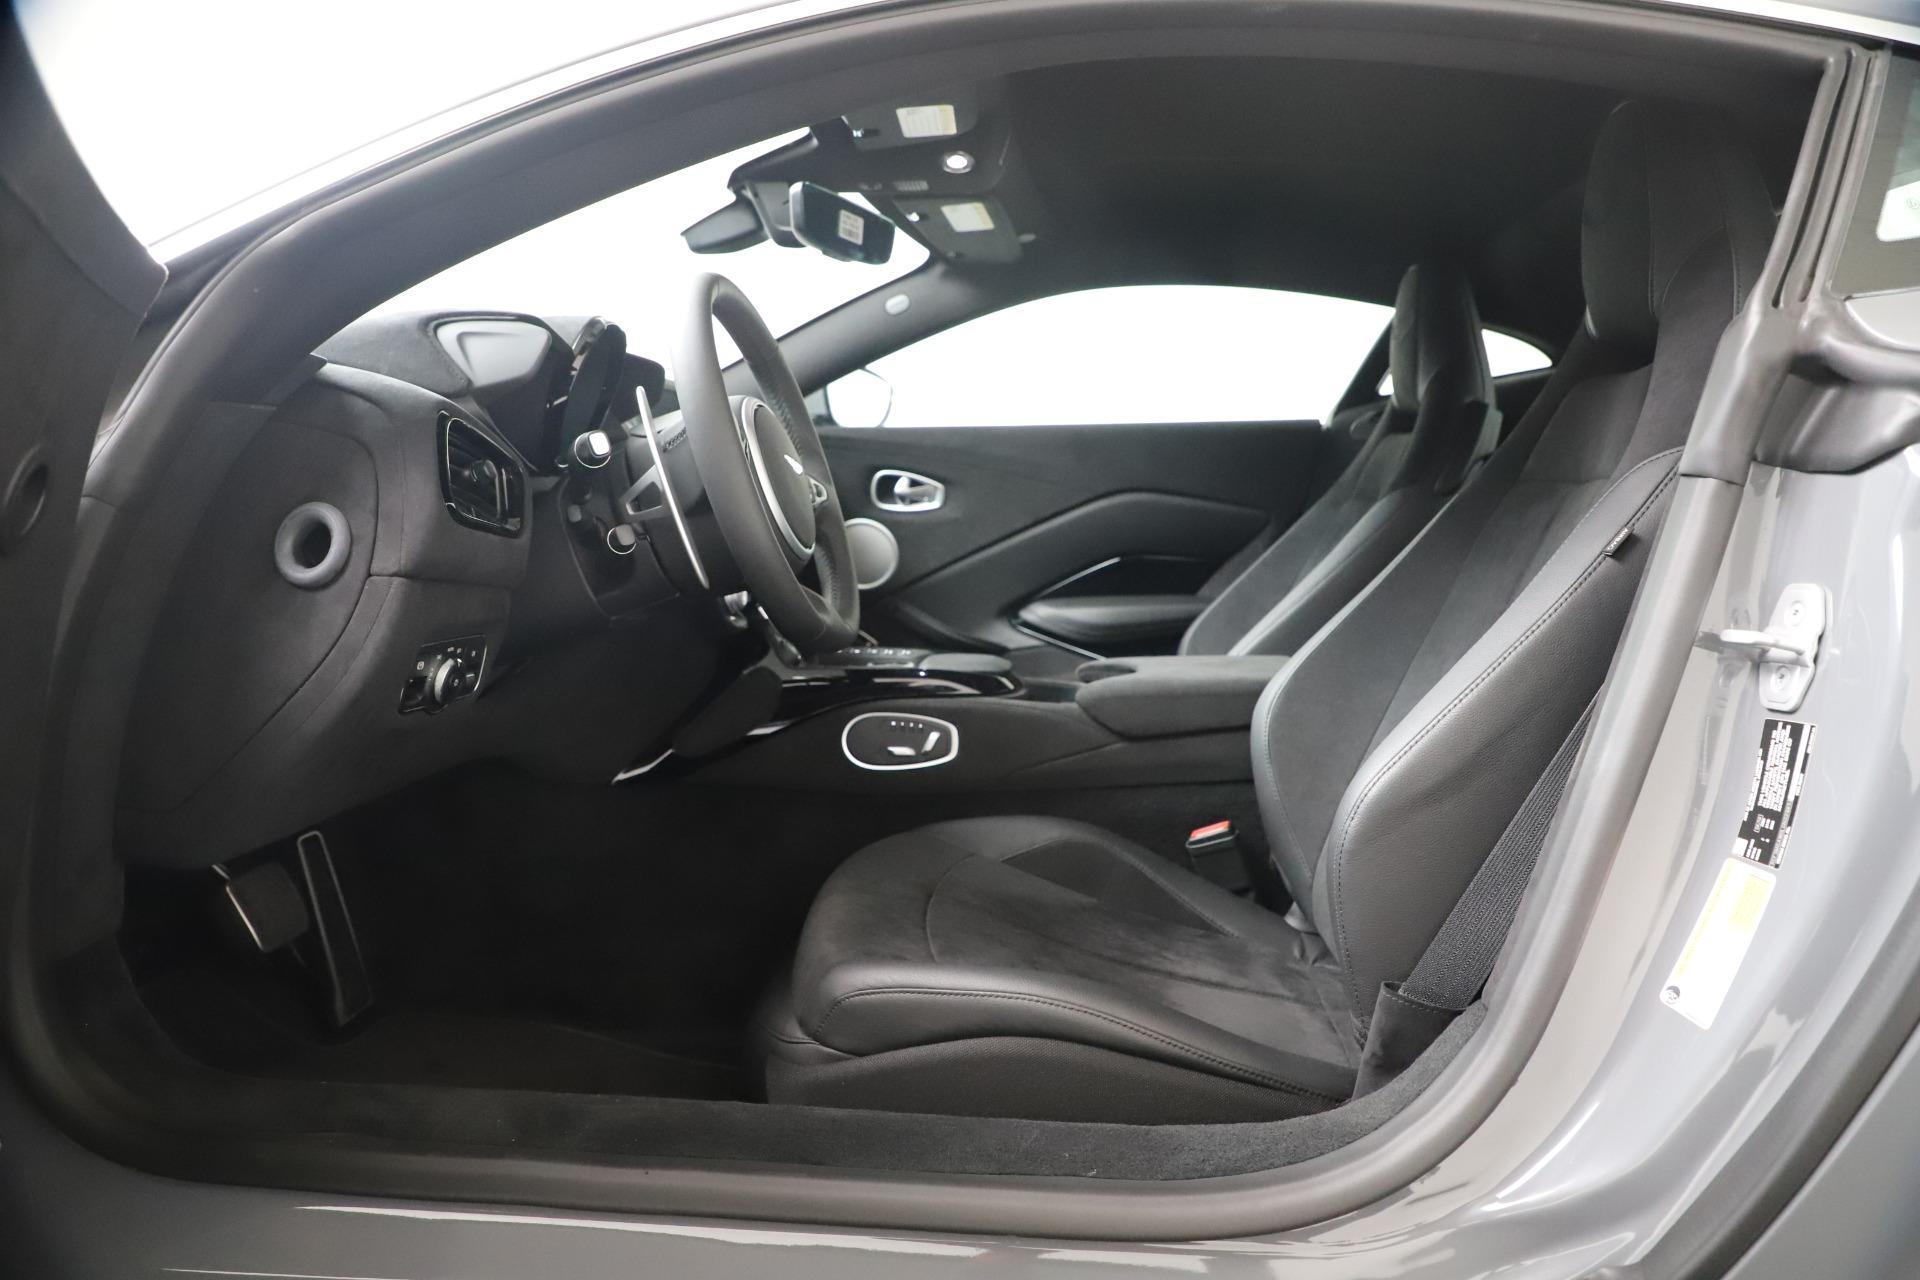 New 2020 Aston Martin Vantage V8 For Sale In Westport, CT 3368_p11